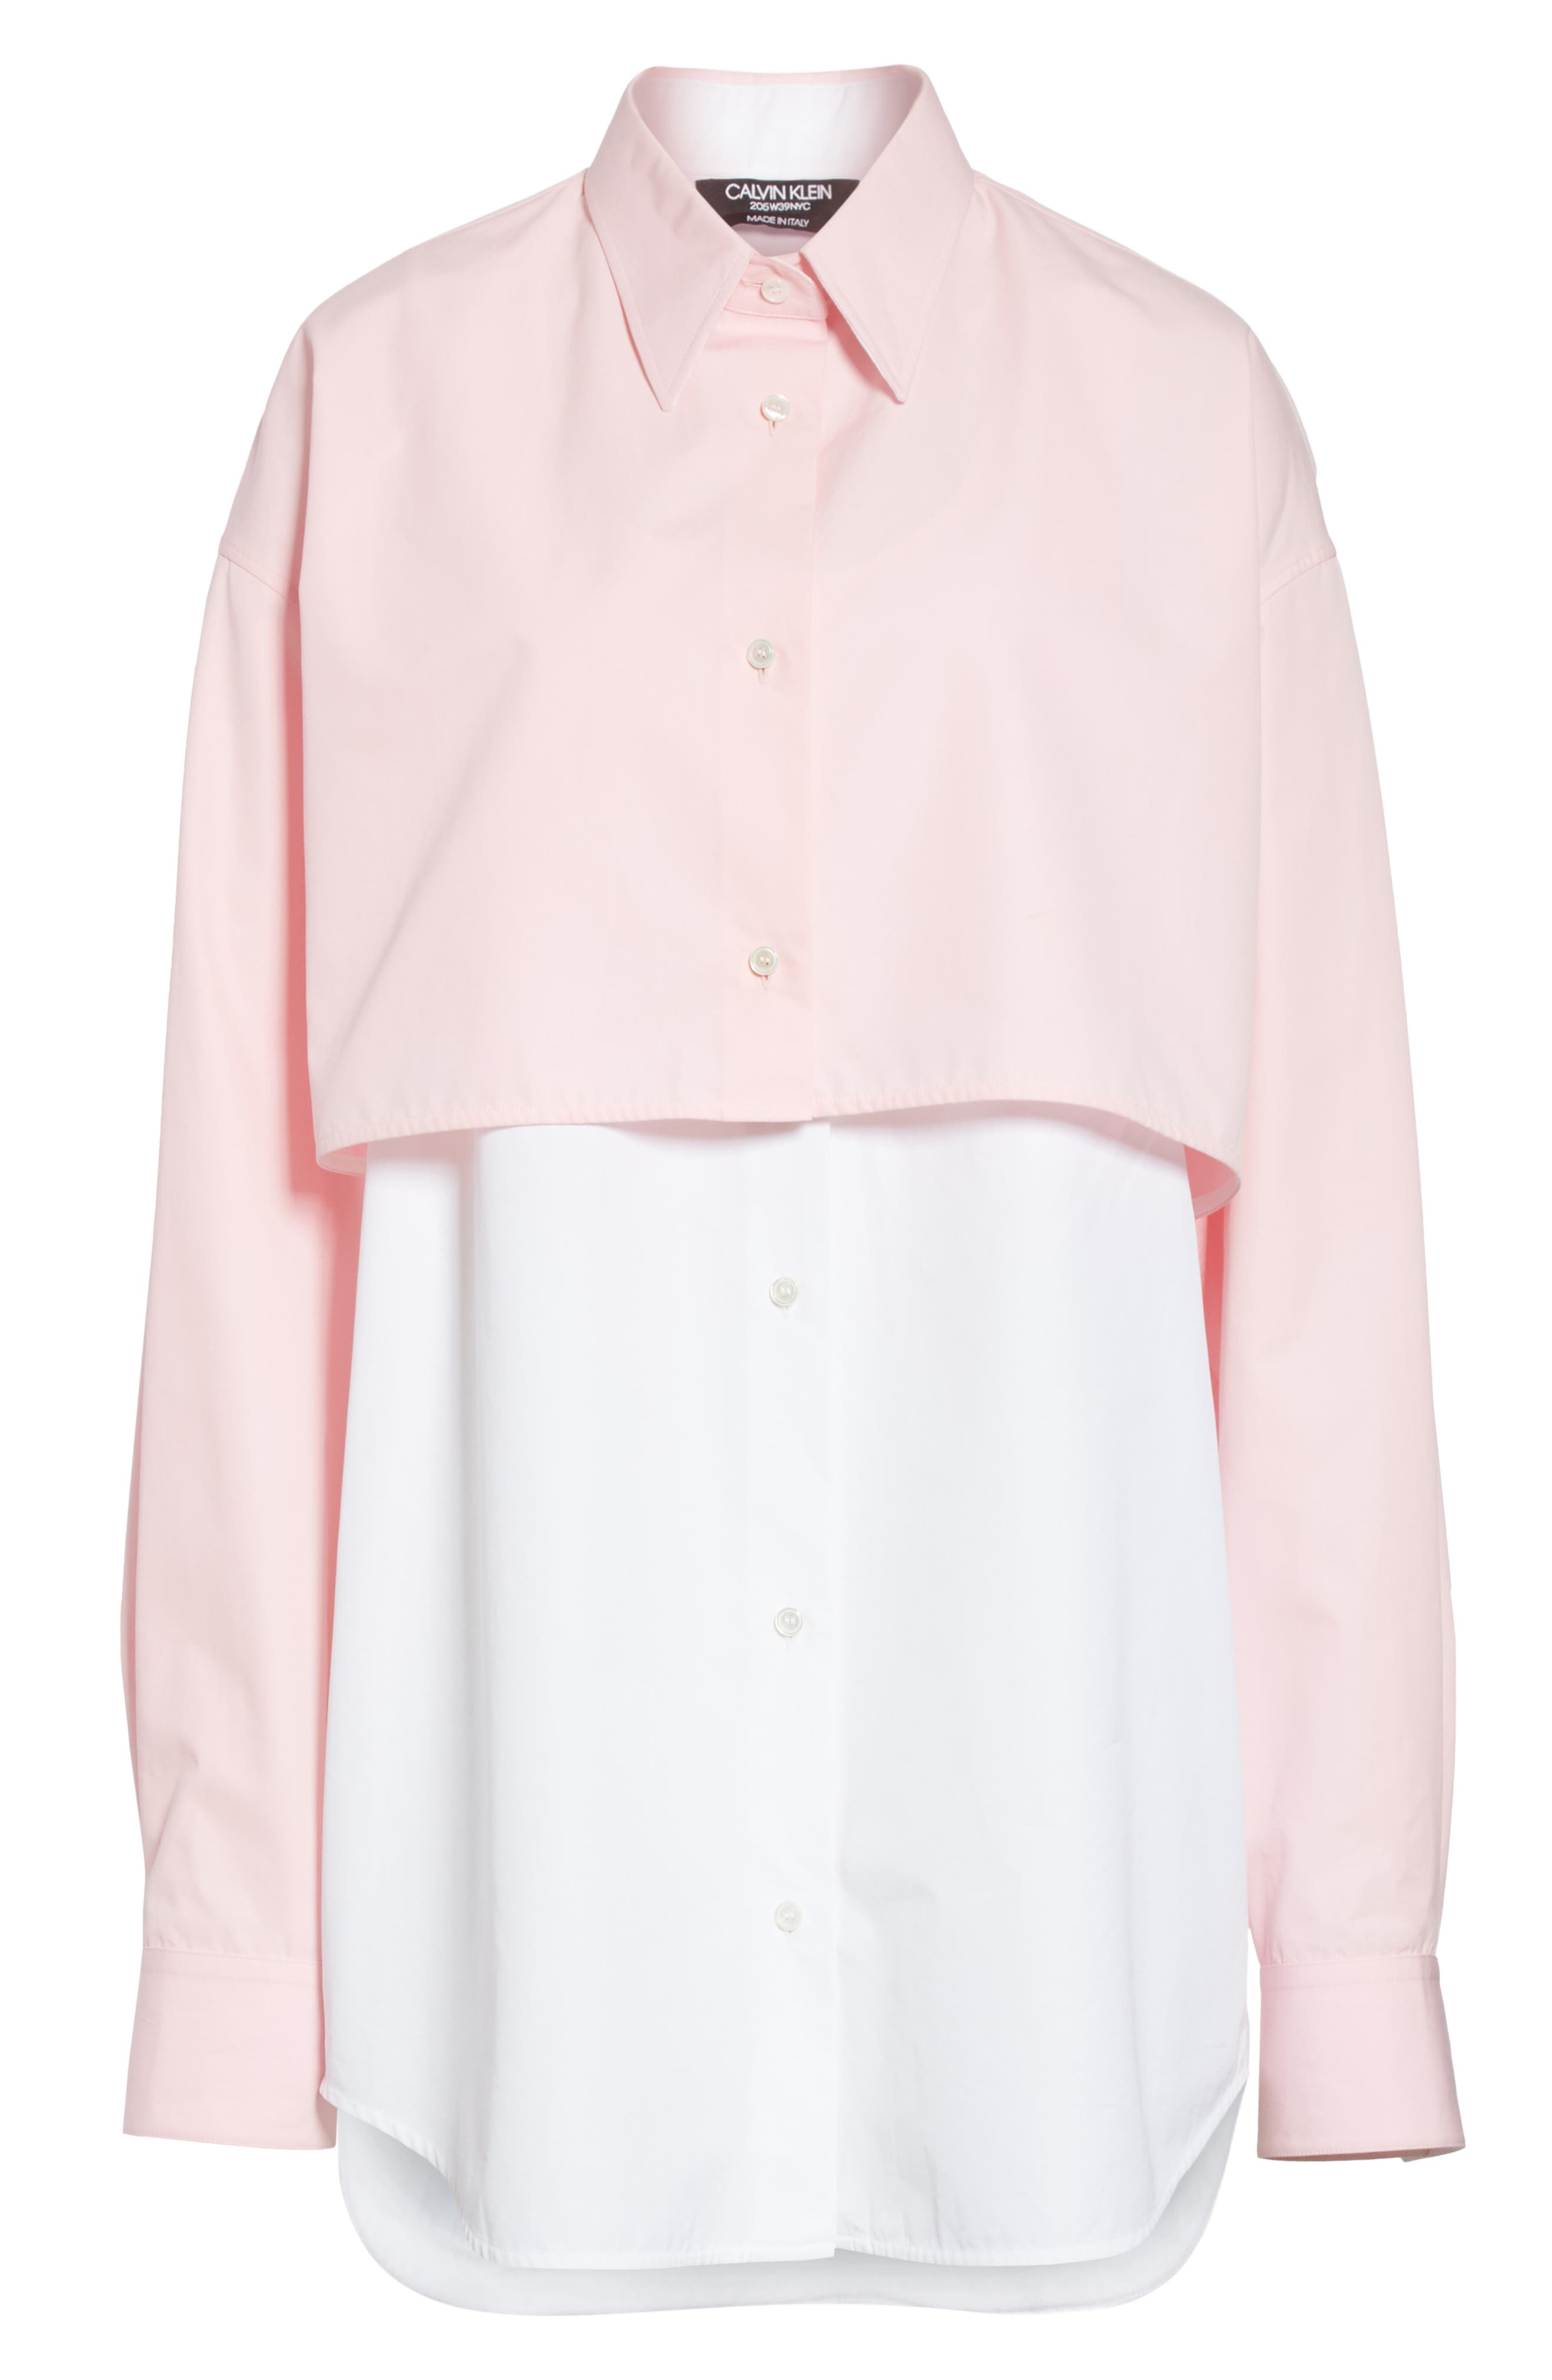 CALVIN KLEIN 205W39NYC, Layered Cotton Poplin Shirt, Alternate thumbnail 8, color, ROSE OPTIC WHITE